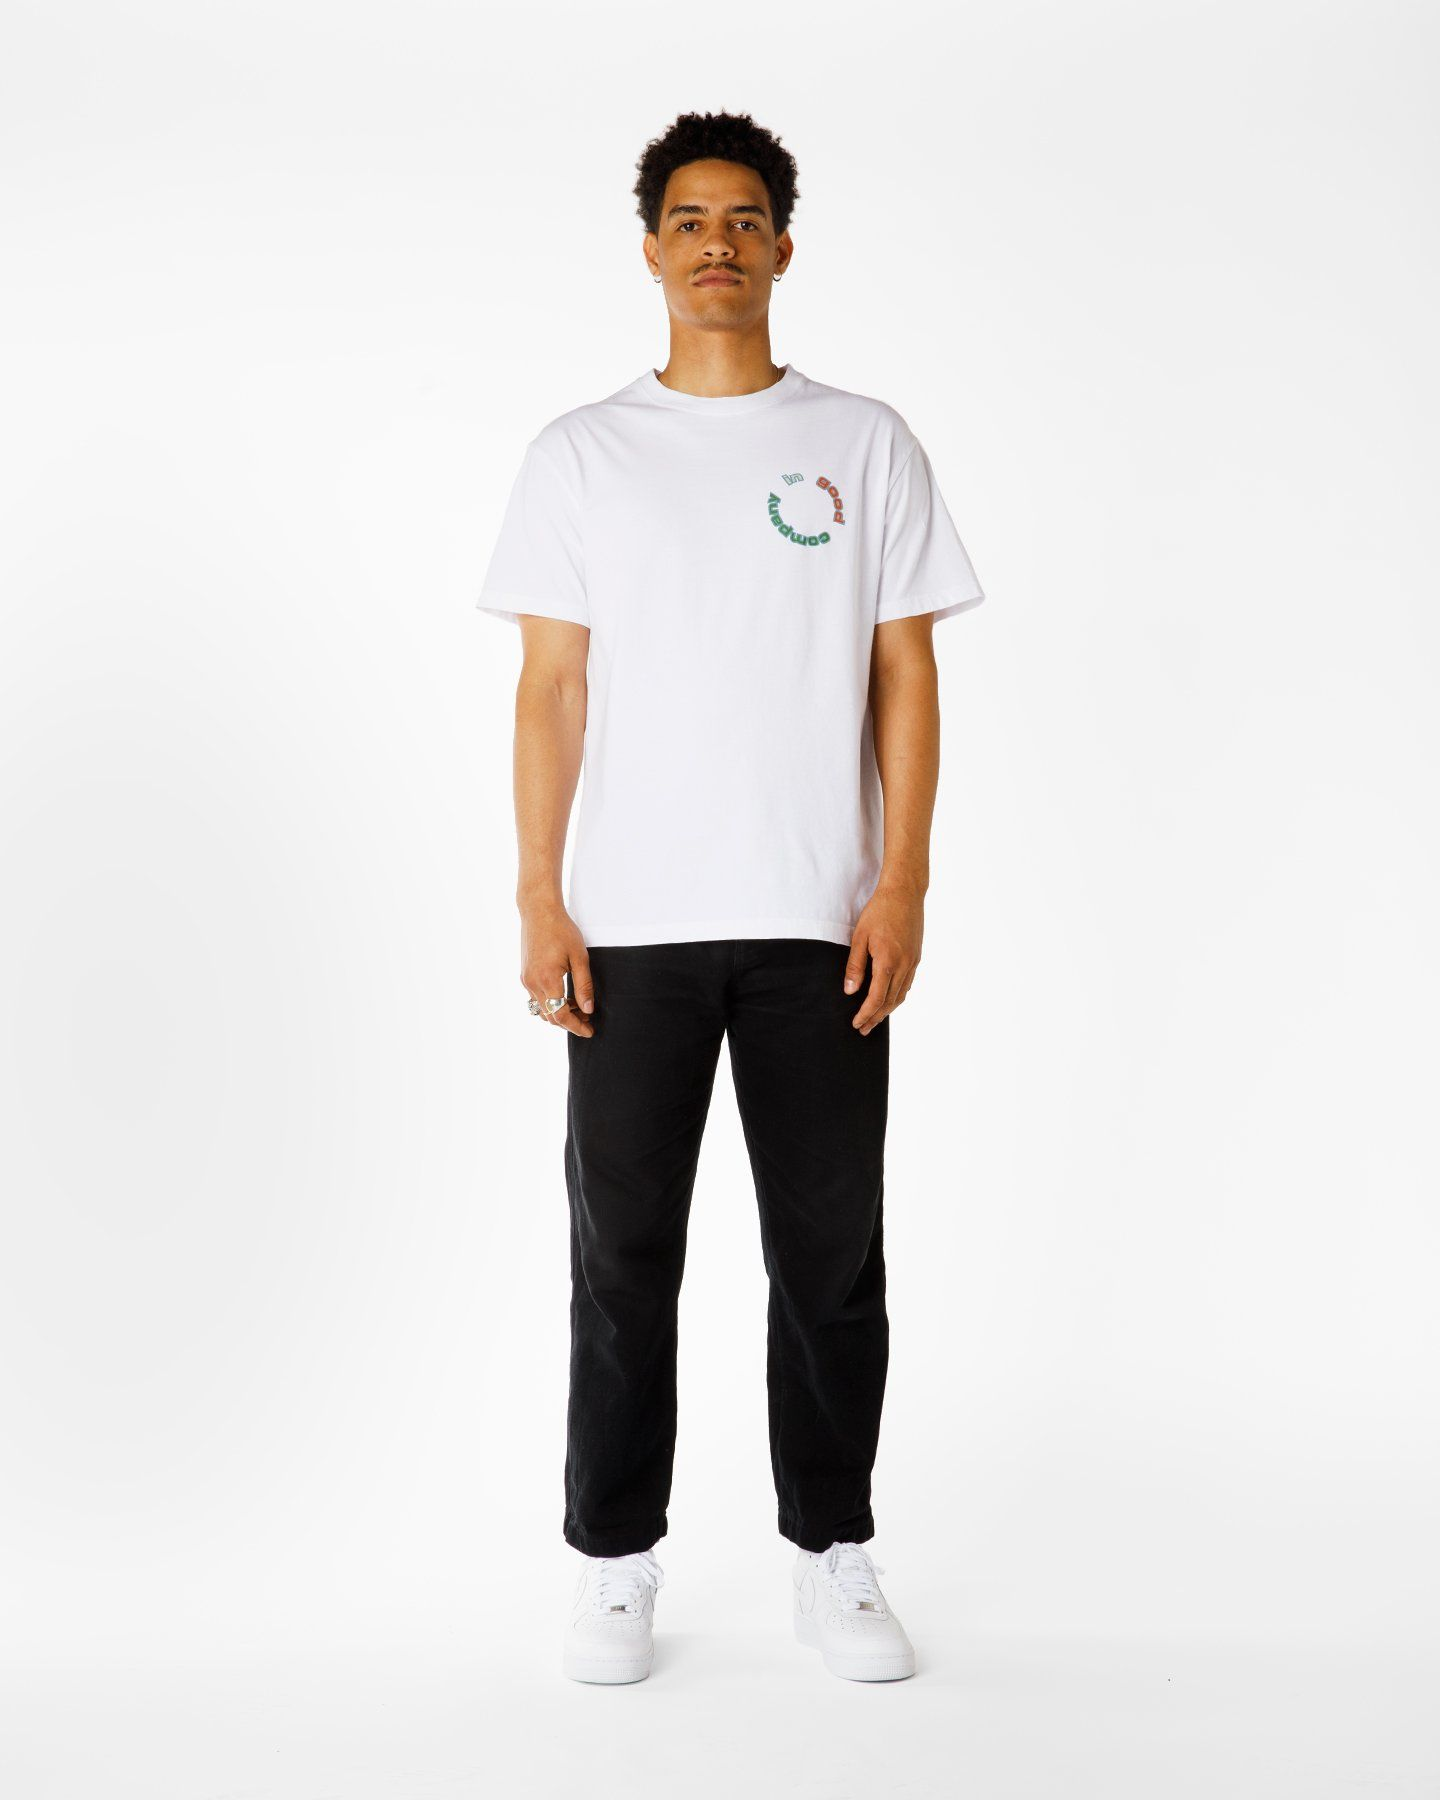 Highsnobiety in Good Company T-Shirt - Image 6